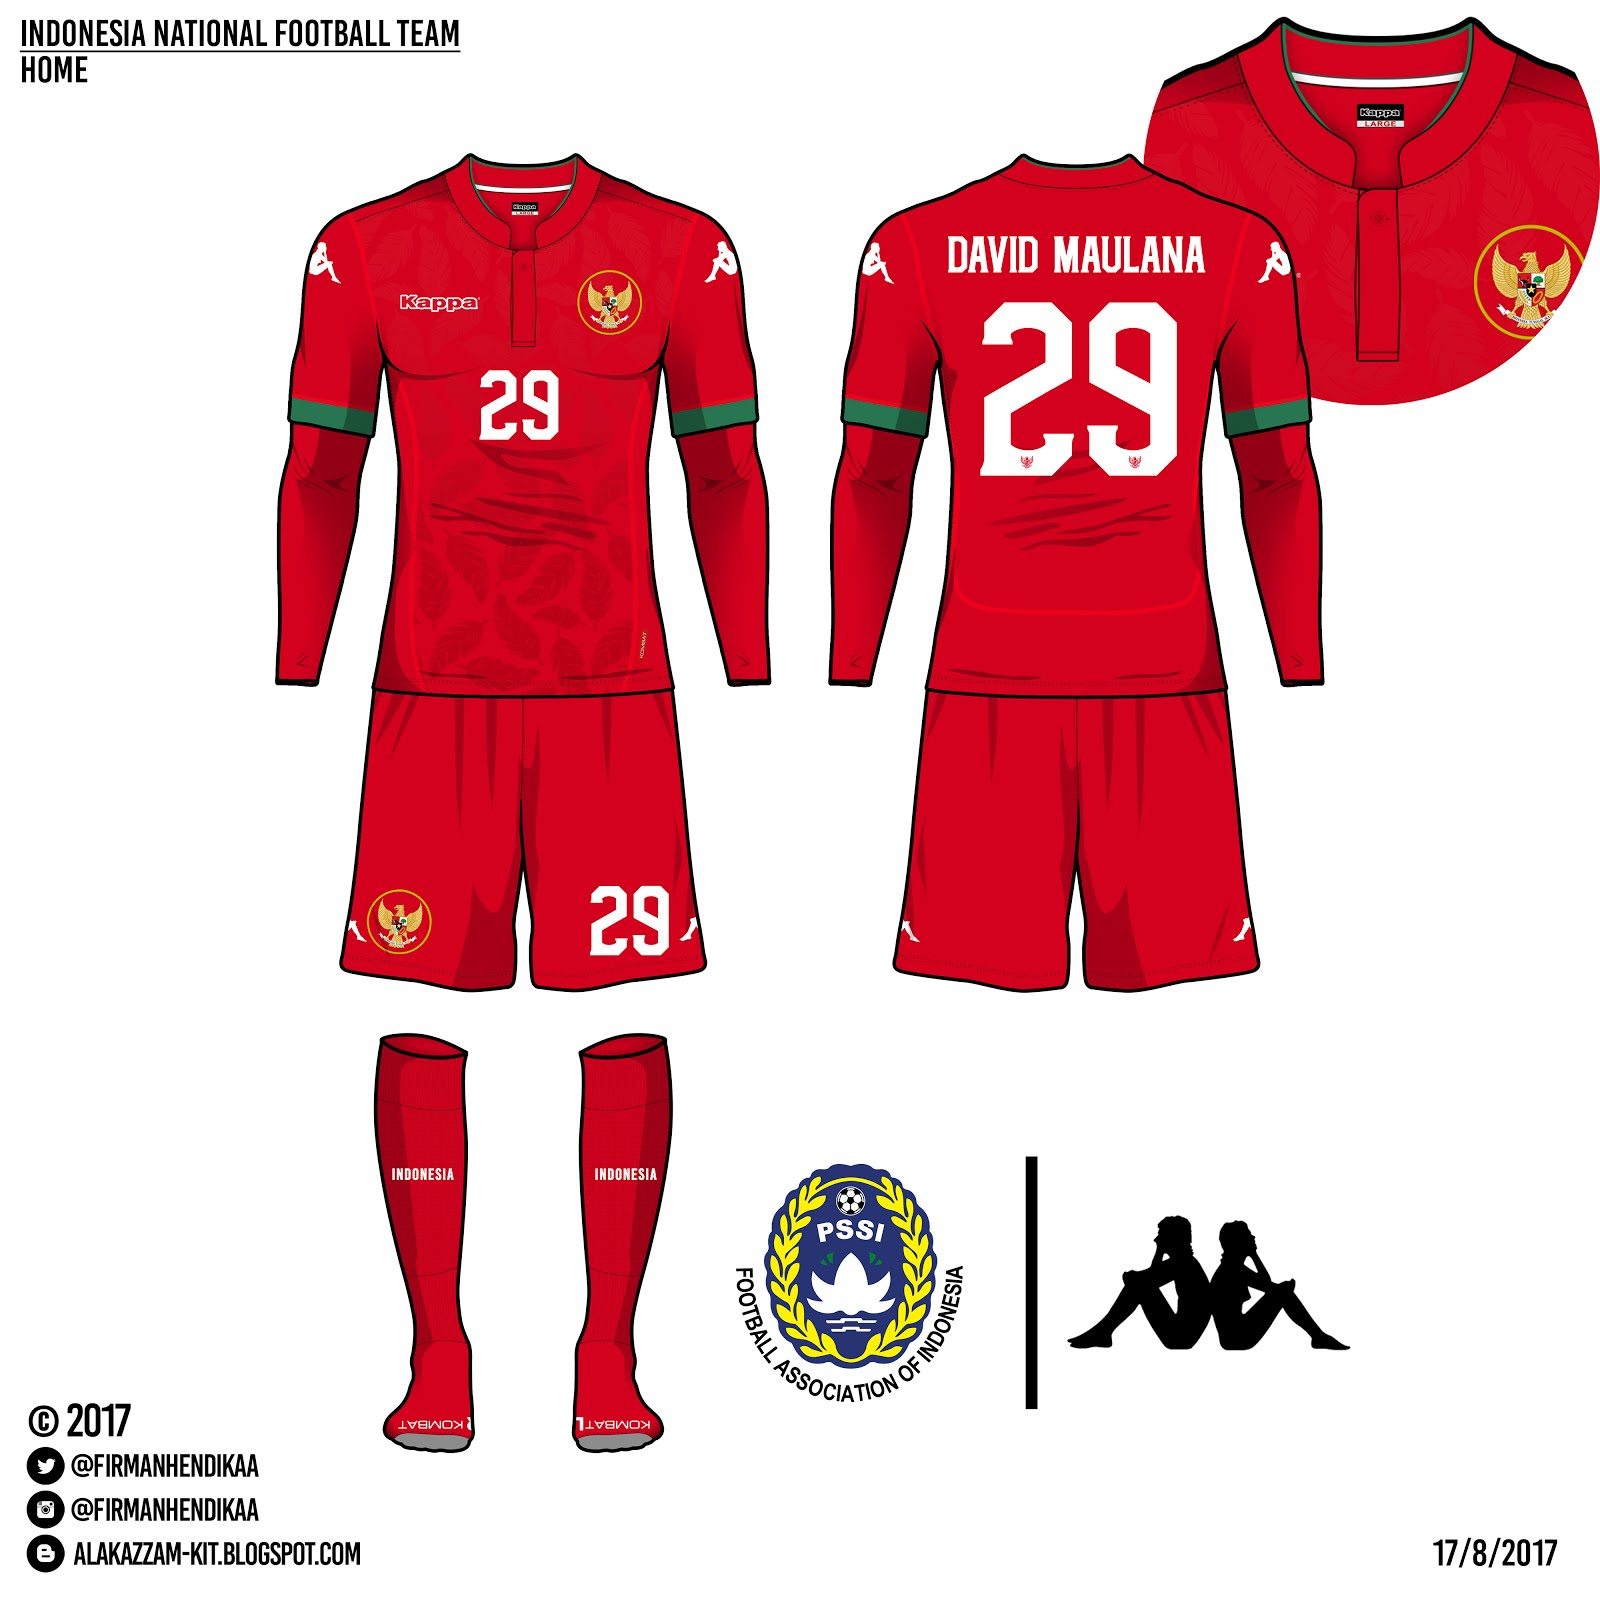 Indonesia National Football Team Fantasy Home  Away Kits Kappa  Alakazzam Kit Design